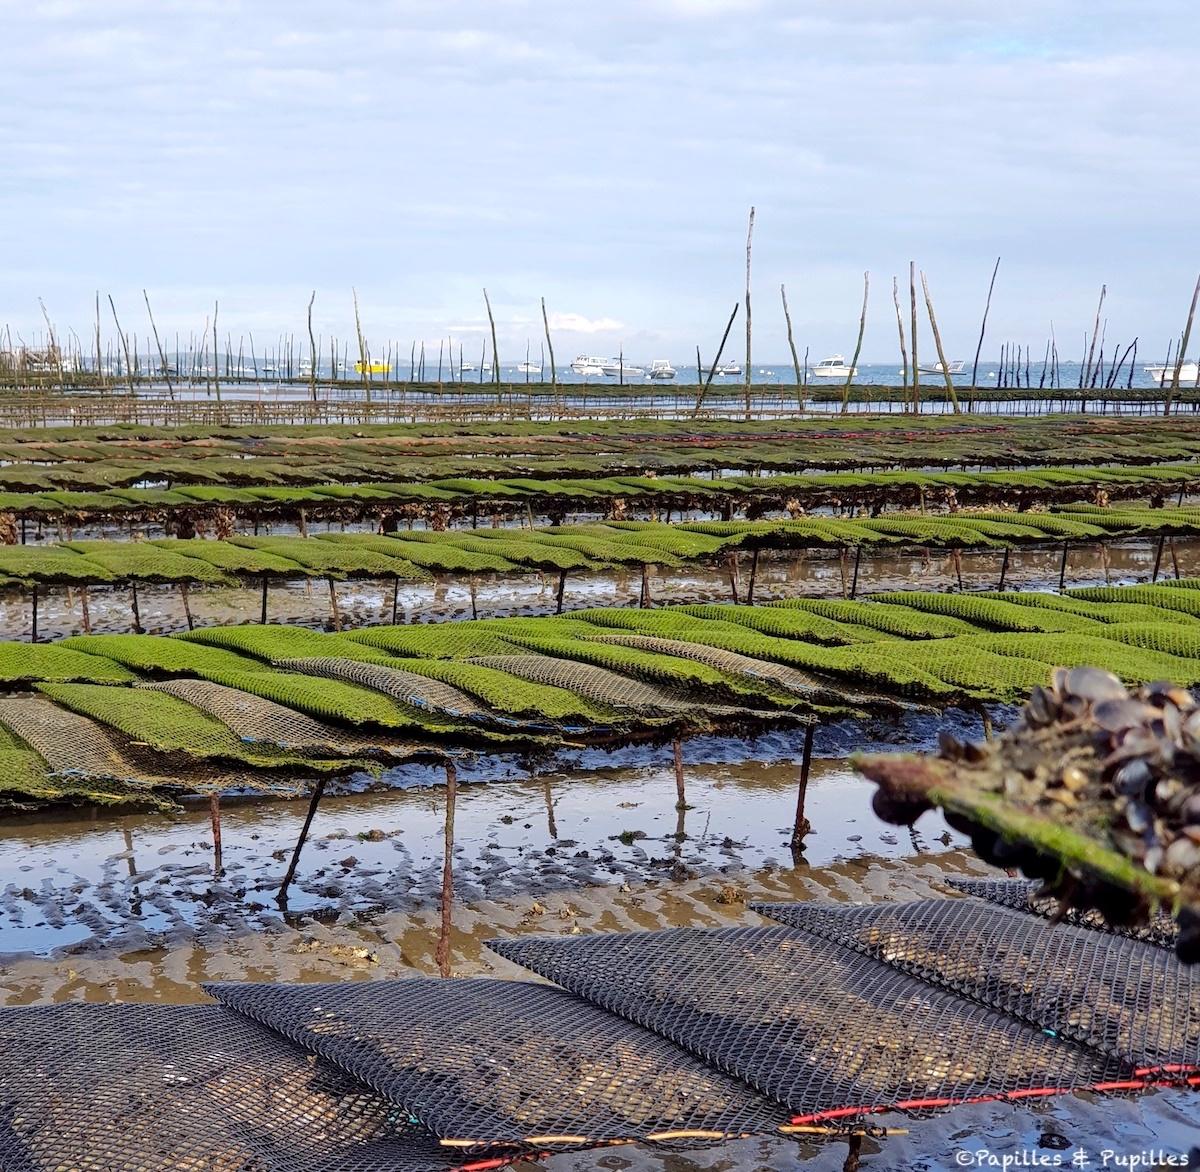 Elevage des huîtres sur tables